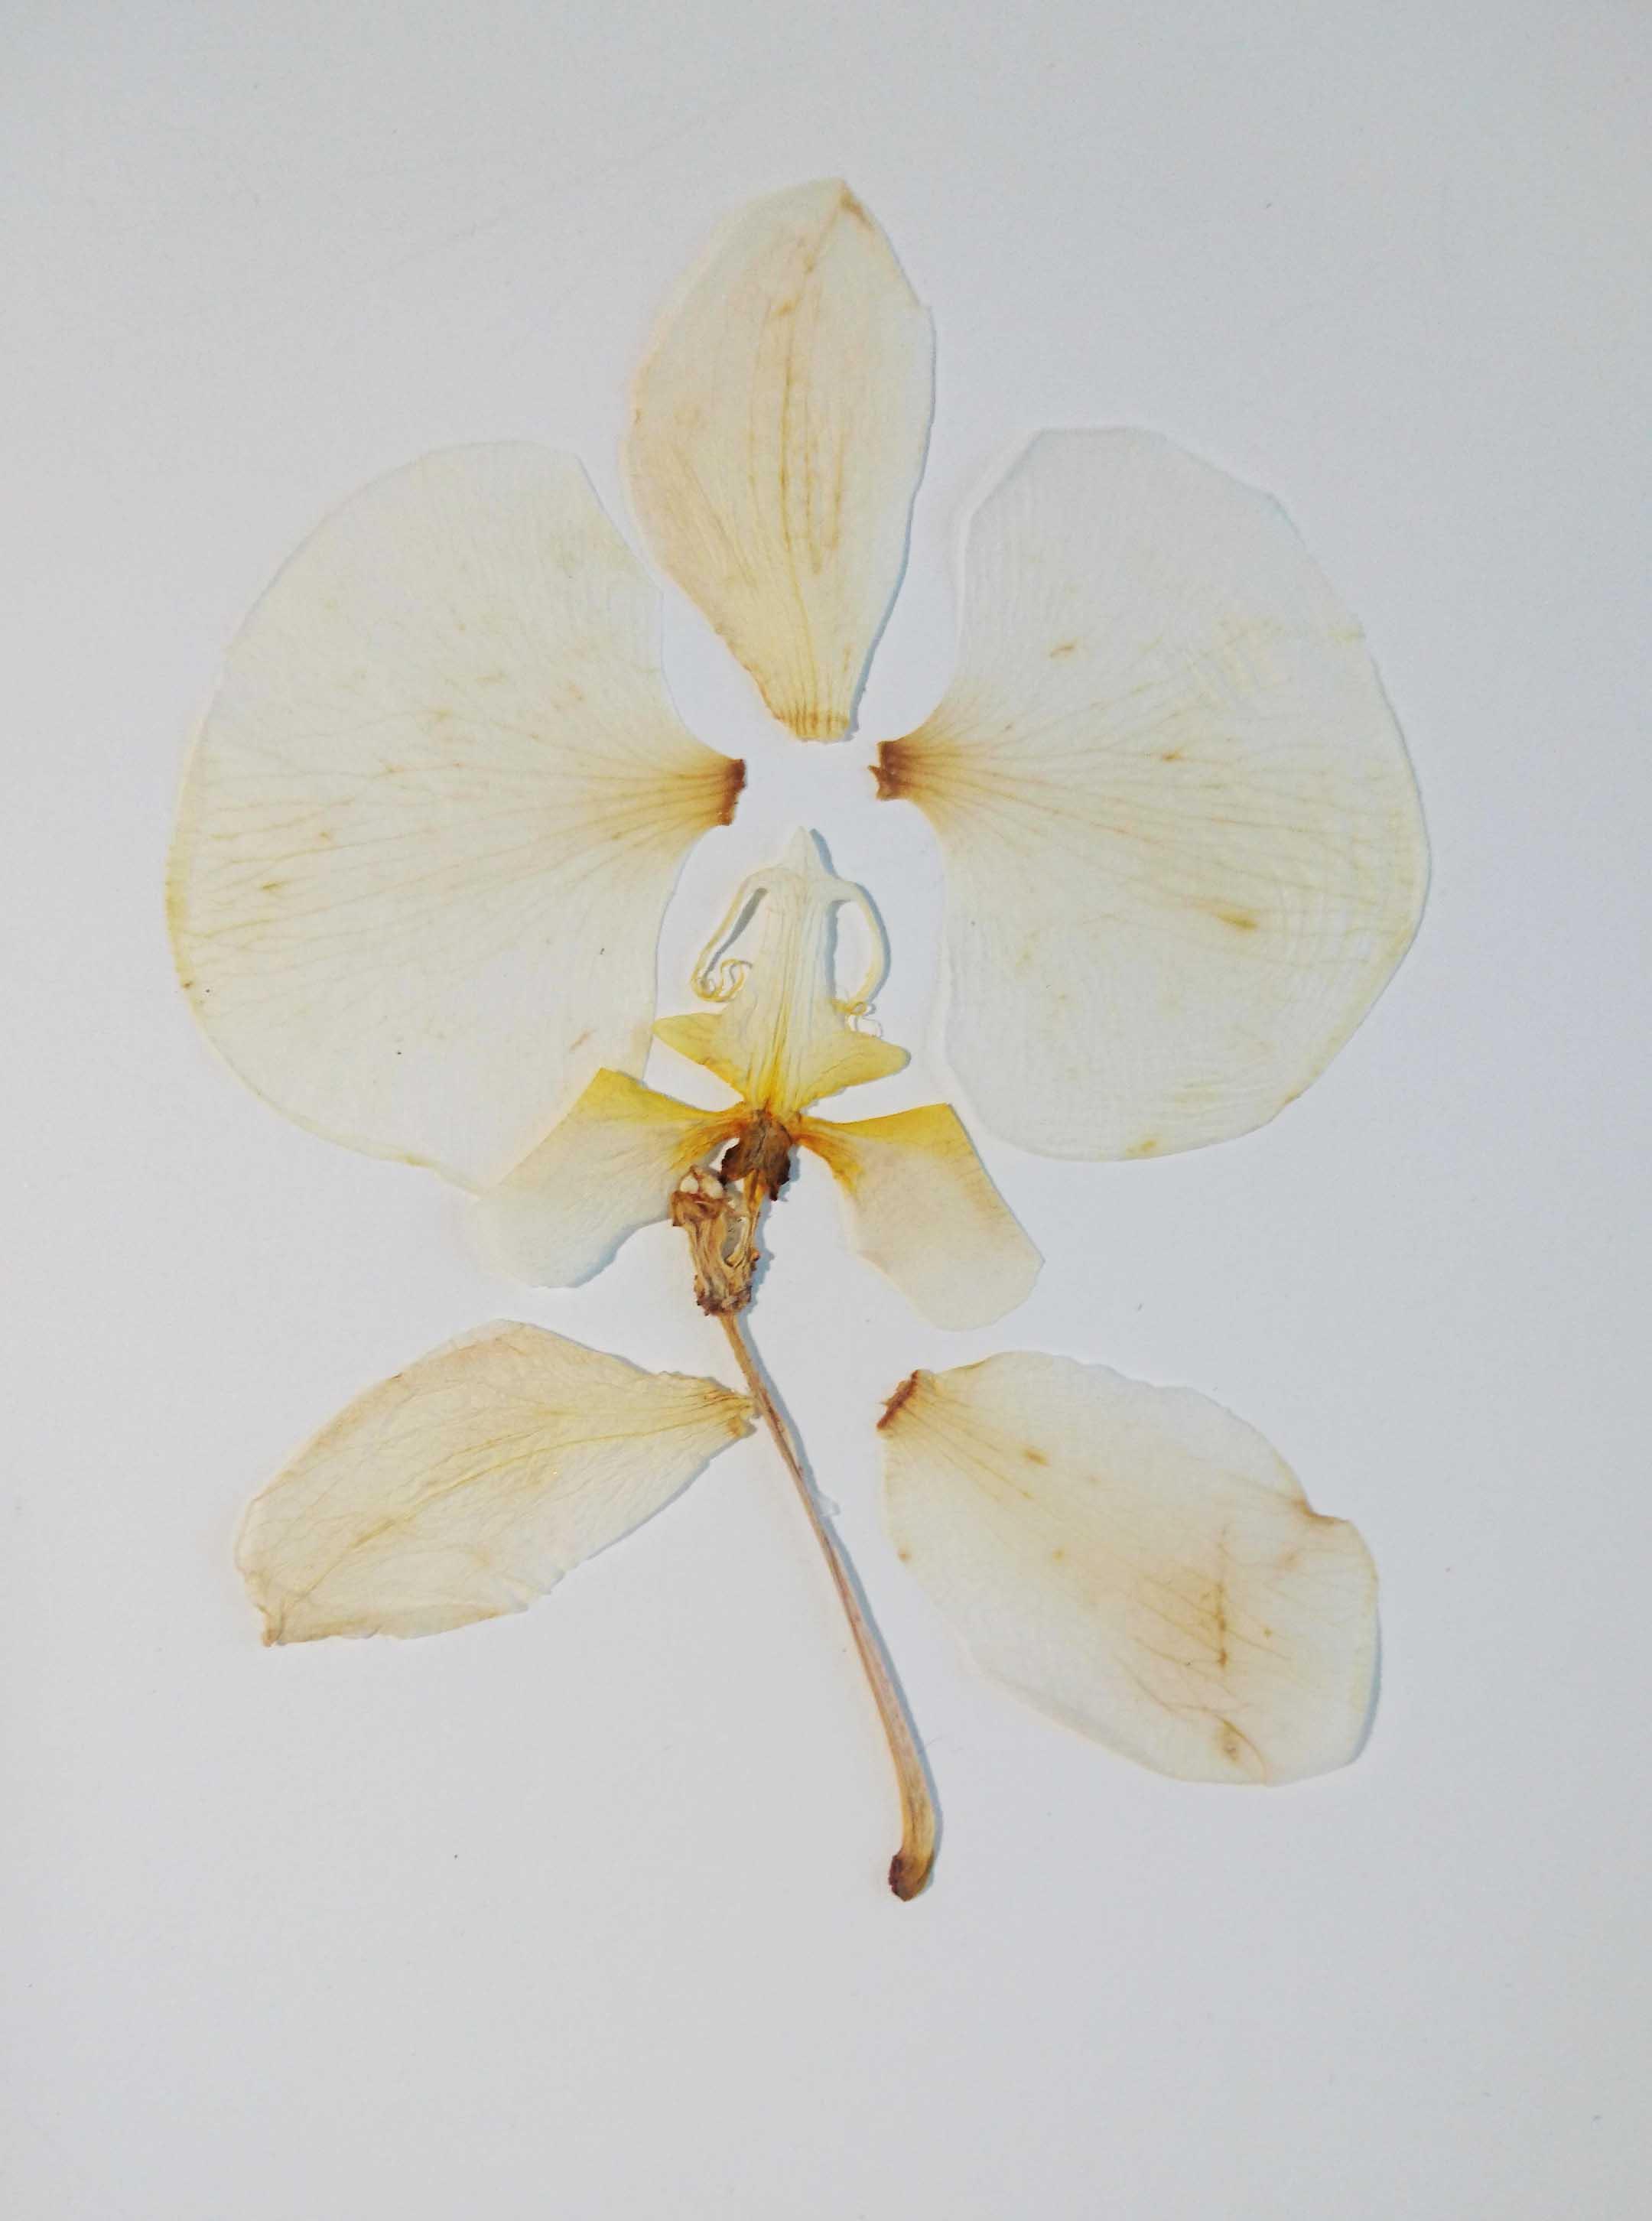 dried orchard petals - silk smooth - transparent - lightness of spirit